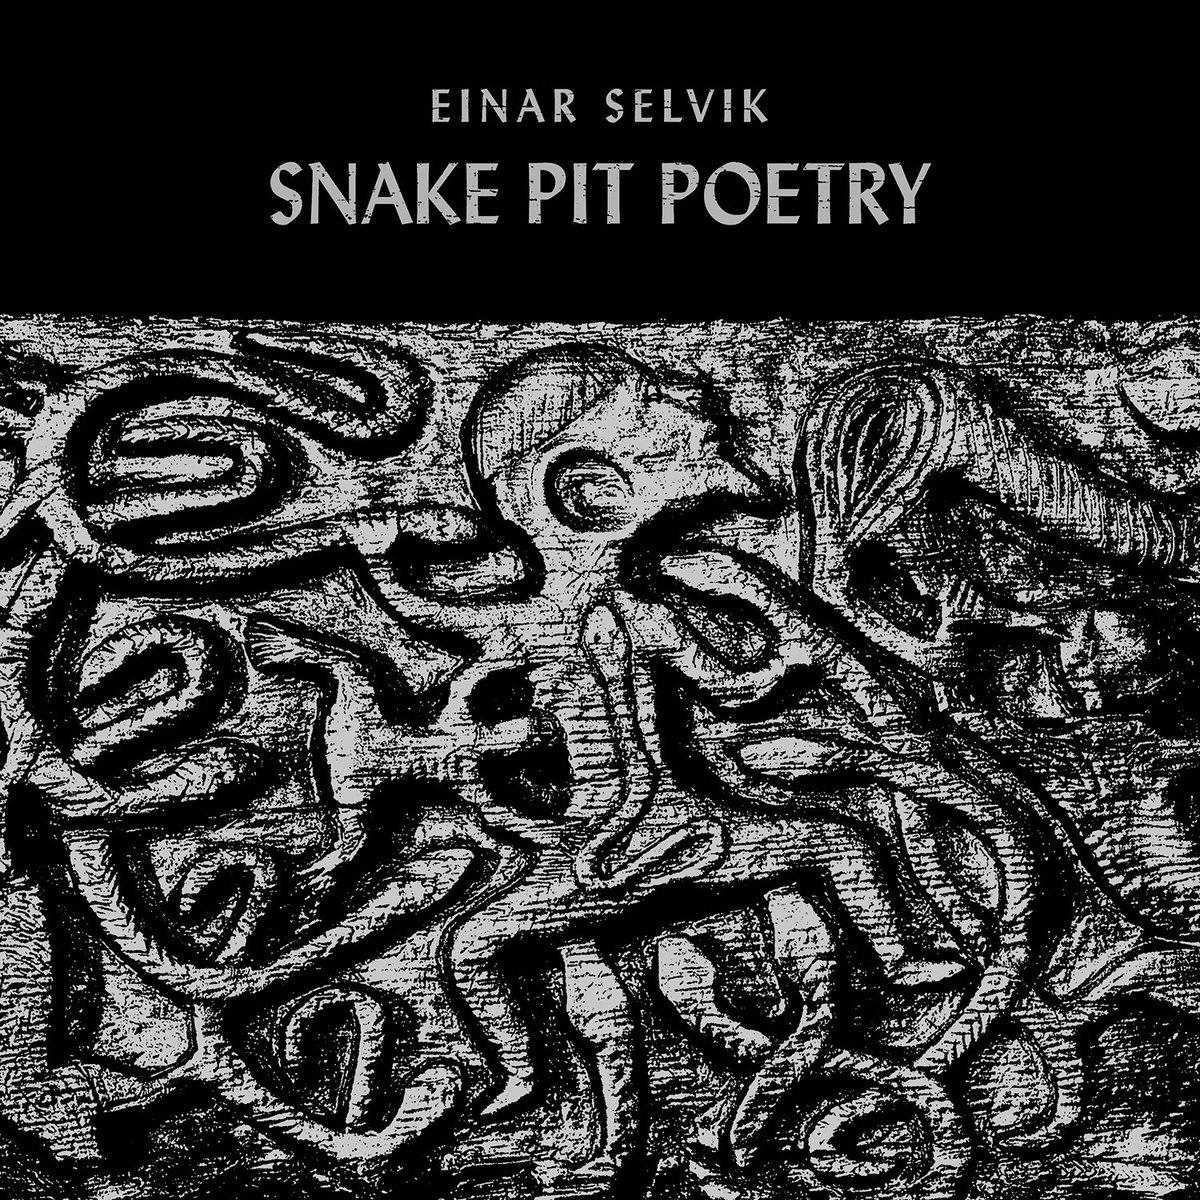 Einar Selvik's Snake Pit Poetry EP will be released on digital platforms October 20. http://www.wardruna.com/news/